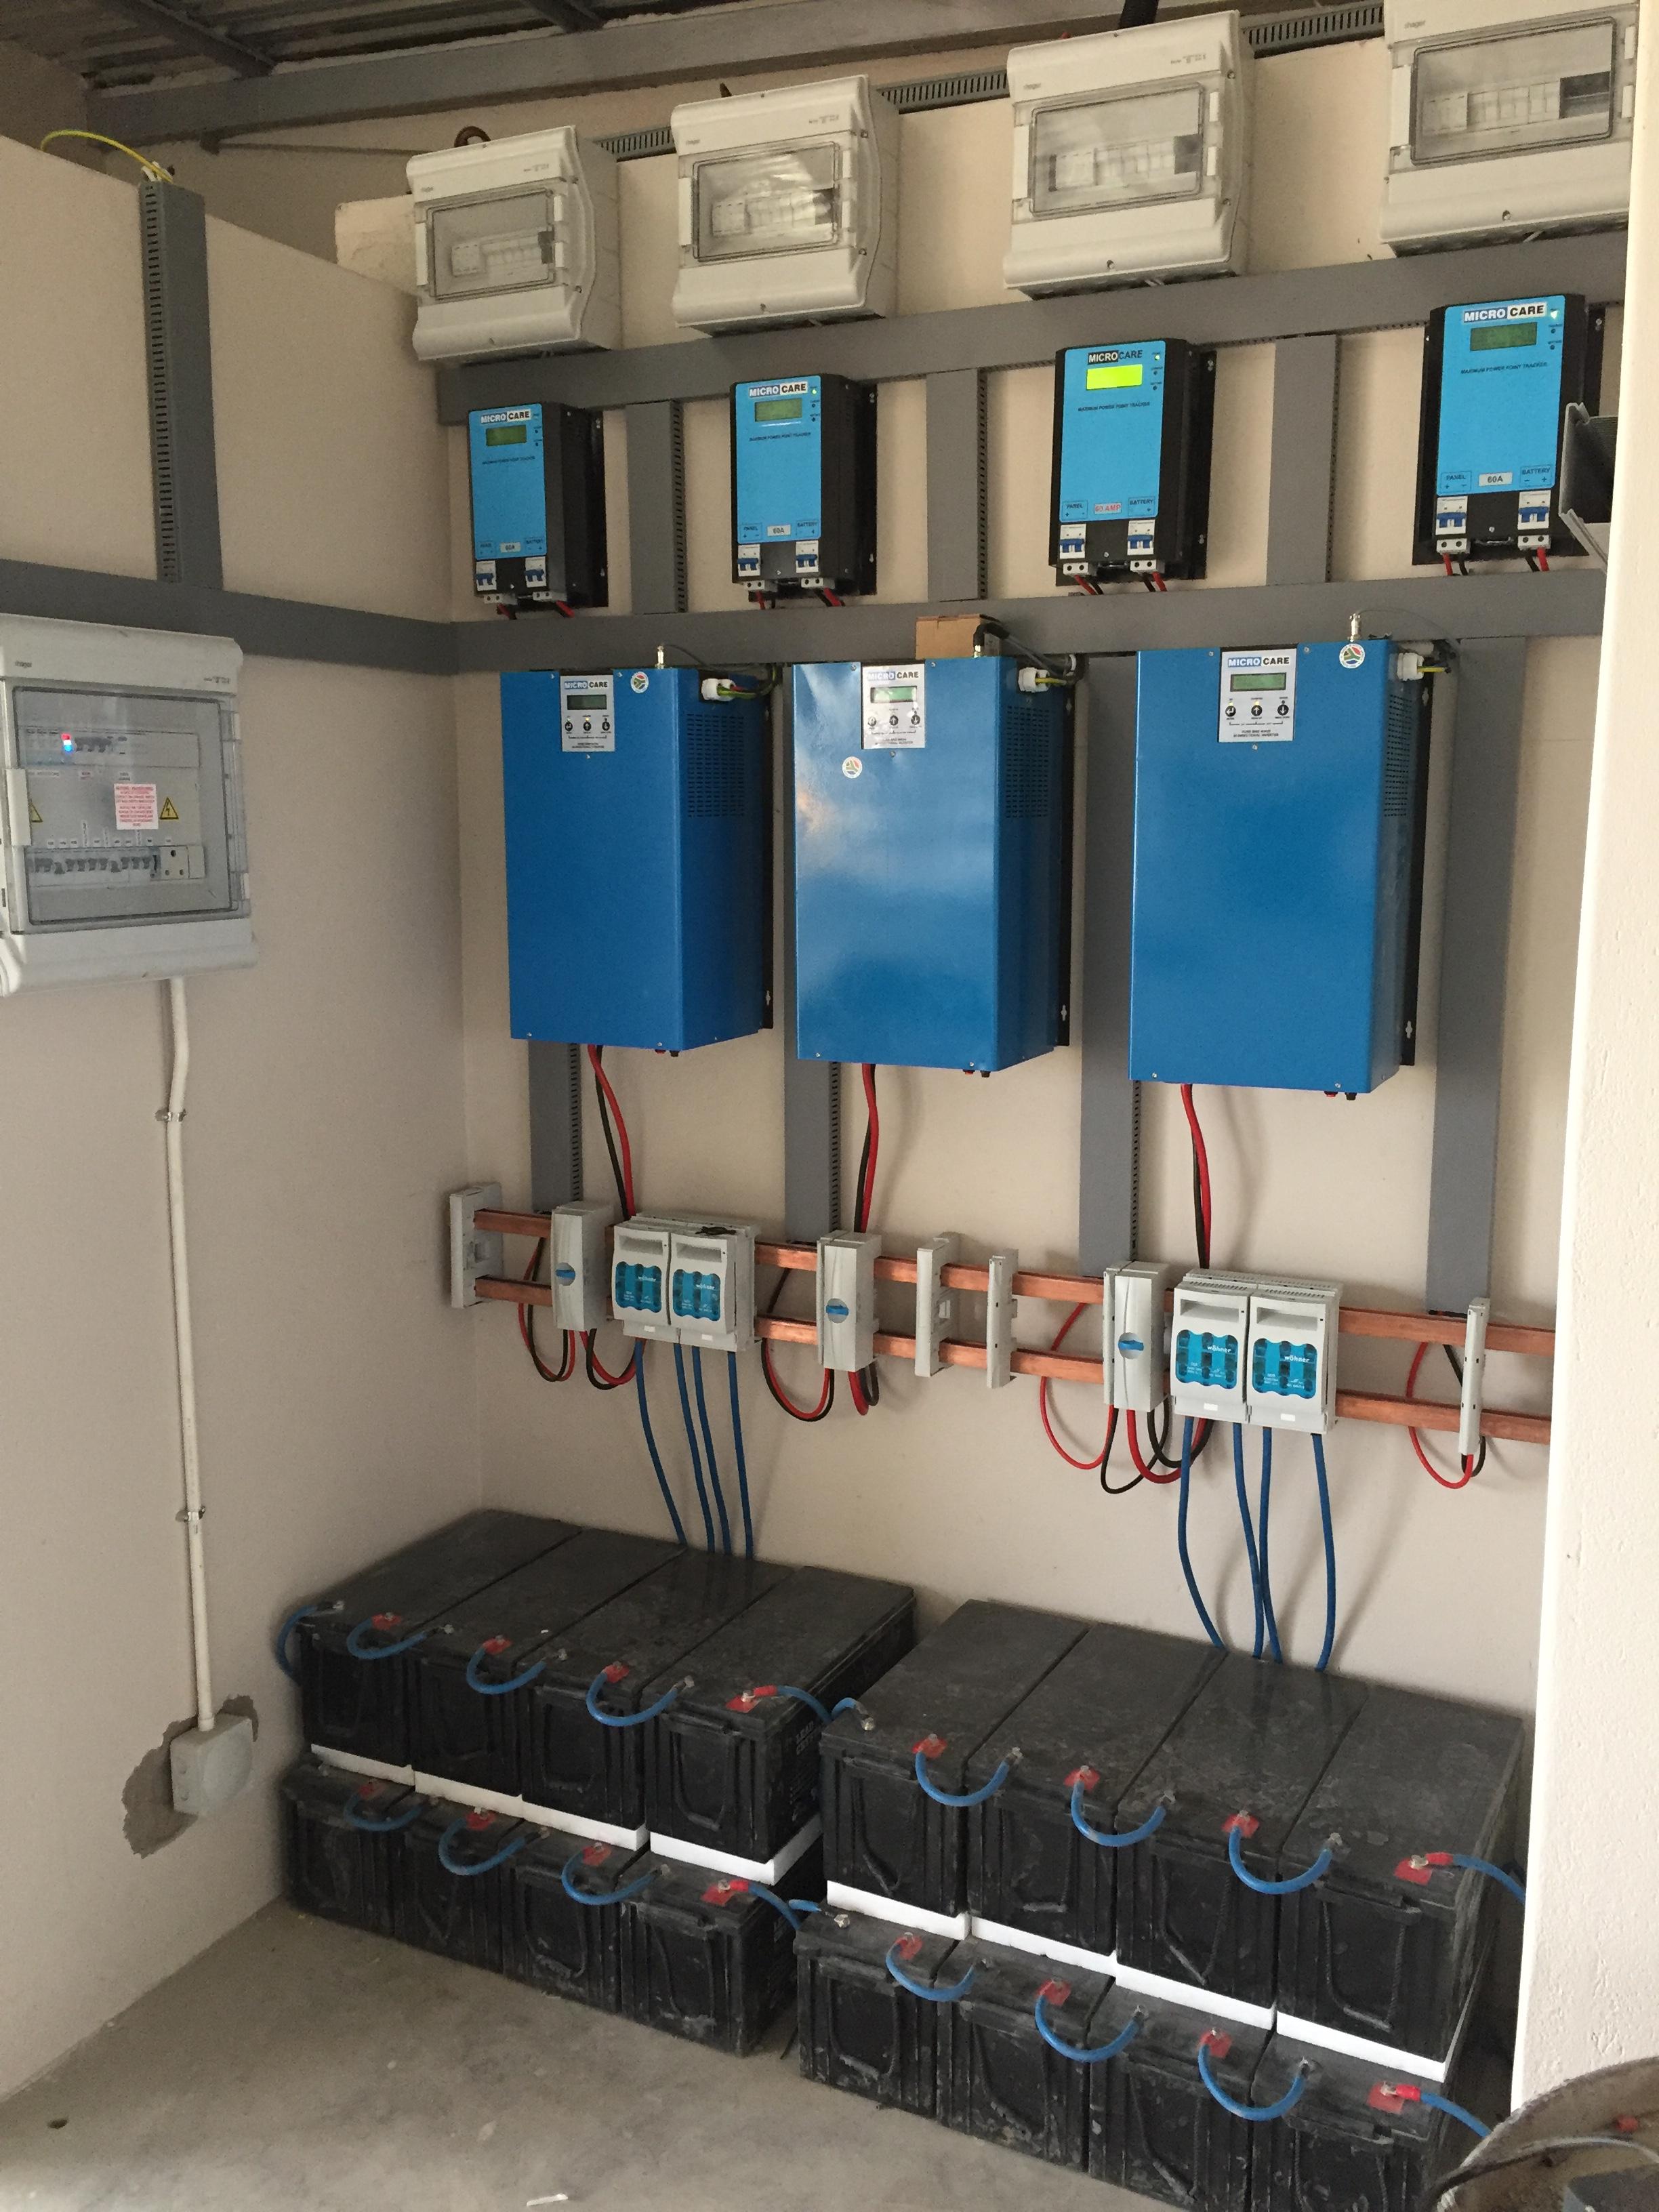 Inverter Battery For Solar System Wiring Connection For Solar Energy